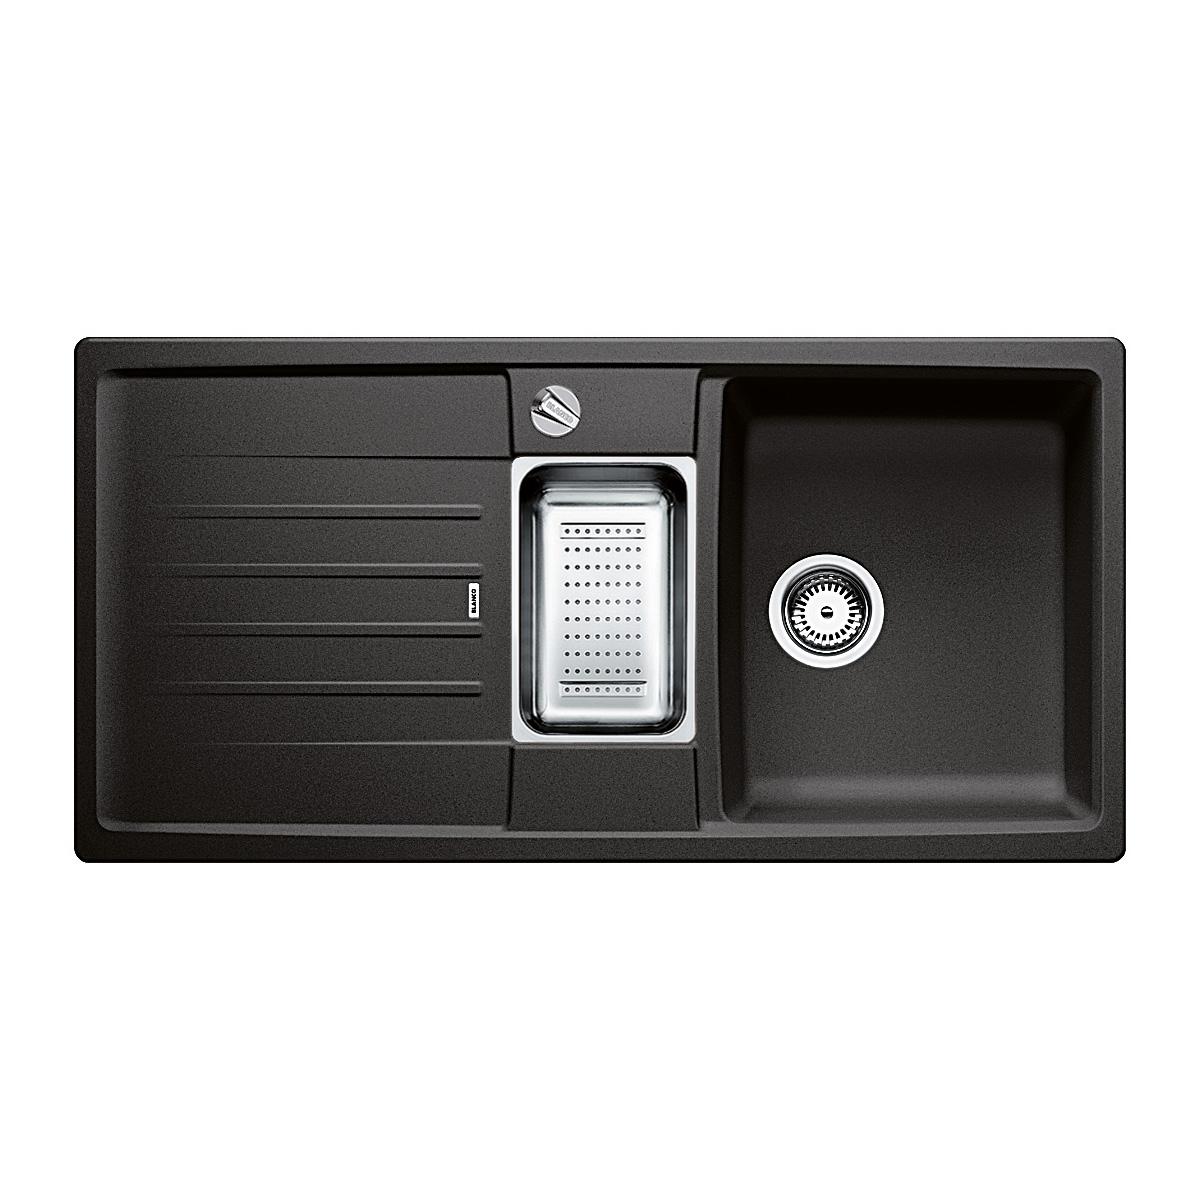 blanco lexa 6 s sp le b 100 t 50 cm becken silgranit puradur ii anthrazit 514676 reuter. Black Bedroom Furniture Sets. Home Design Ideas